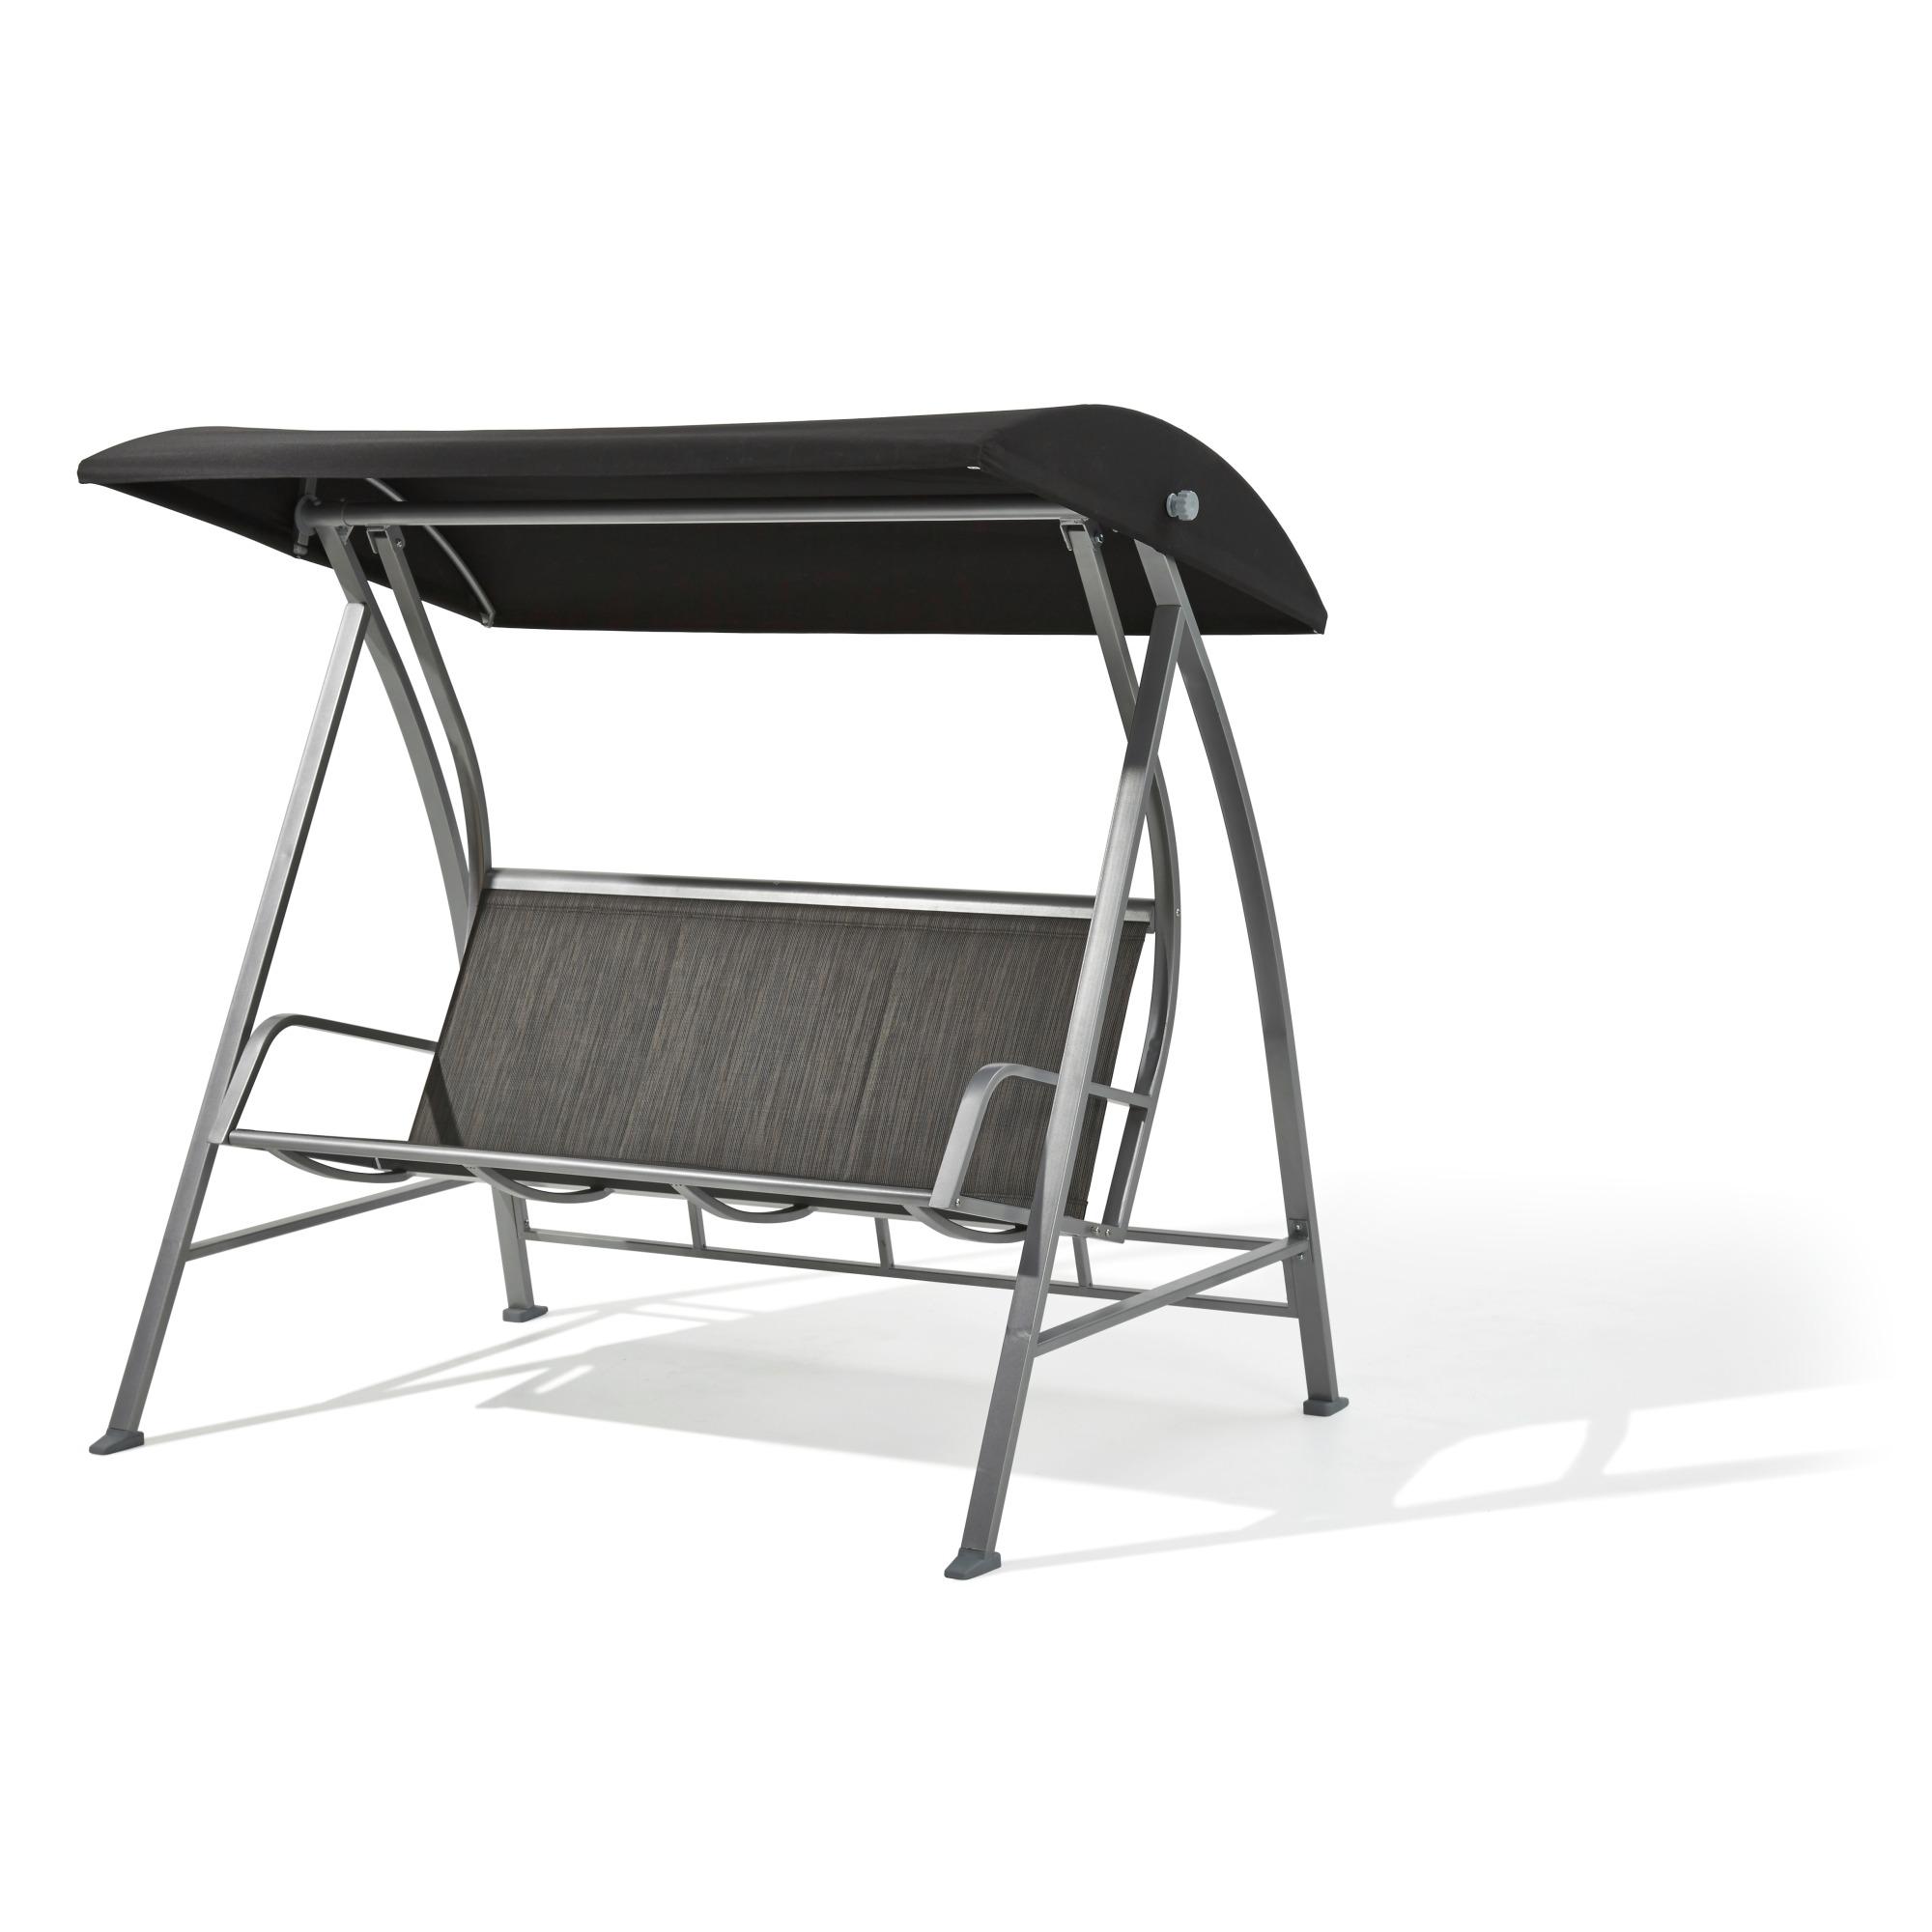 Balancelle montr al hamacs balancelles meubles de for Meuble jardin montreal